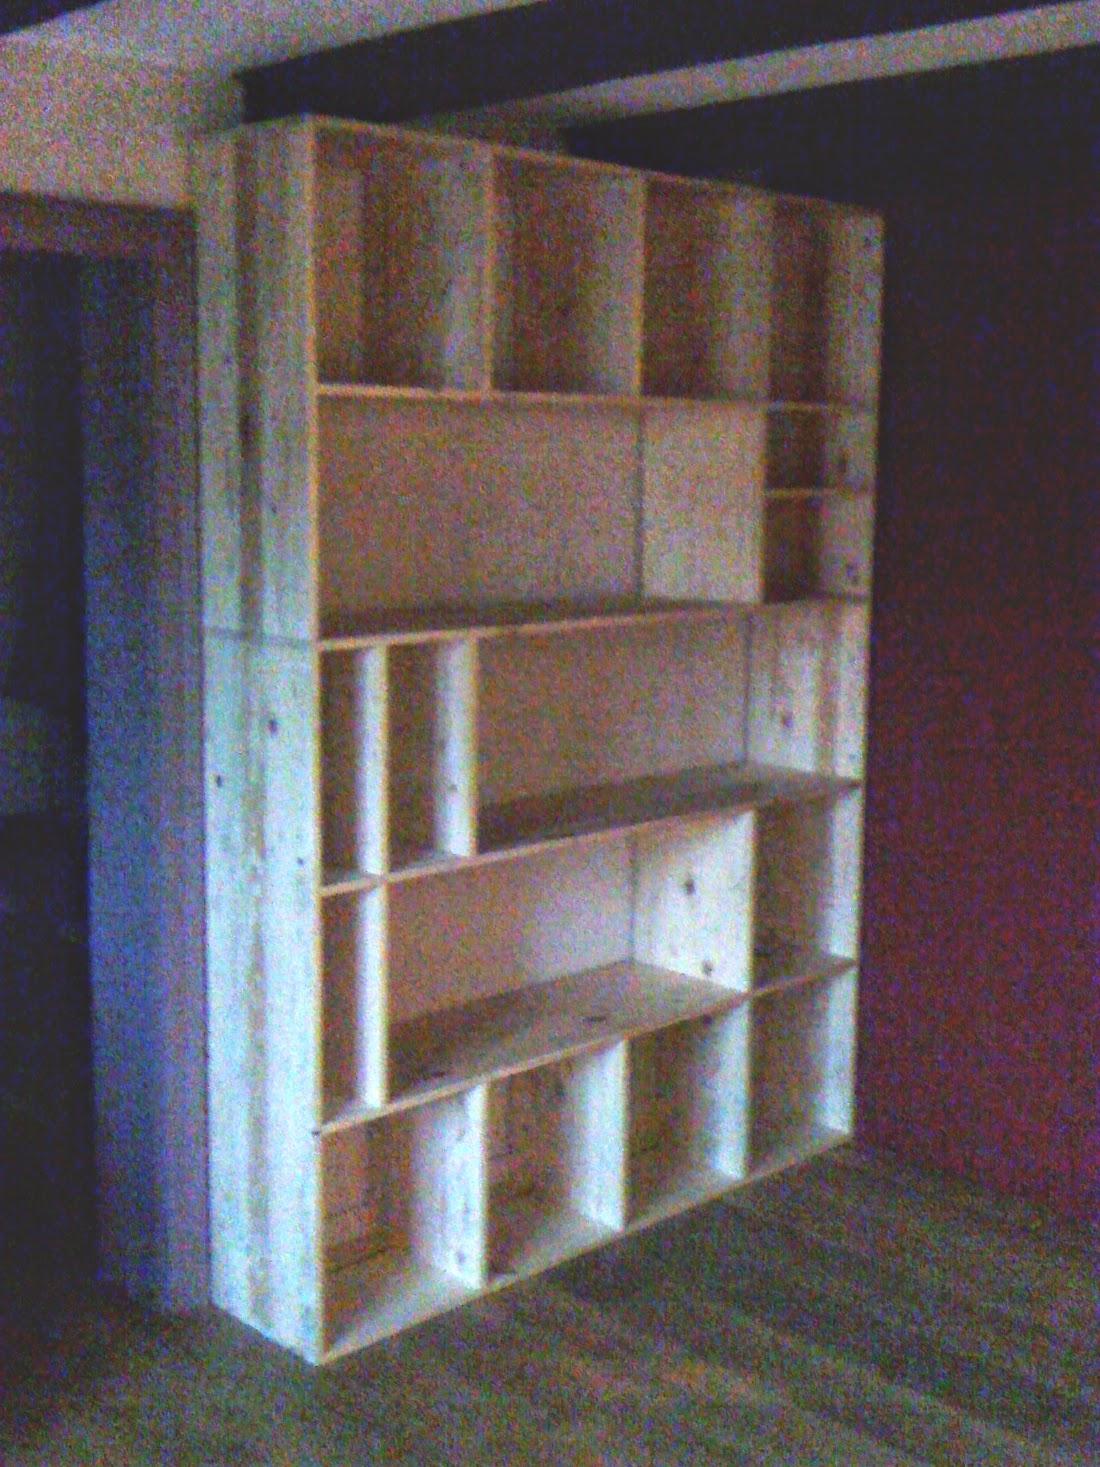 palettes de solutions strasbourg biblioth que palettes 1 60x2 20m. Black Bedroom Furniture Sets. Home Design Ideas